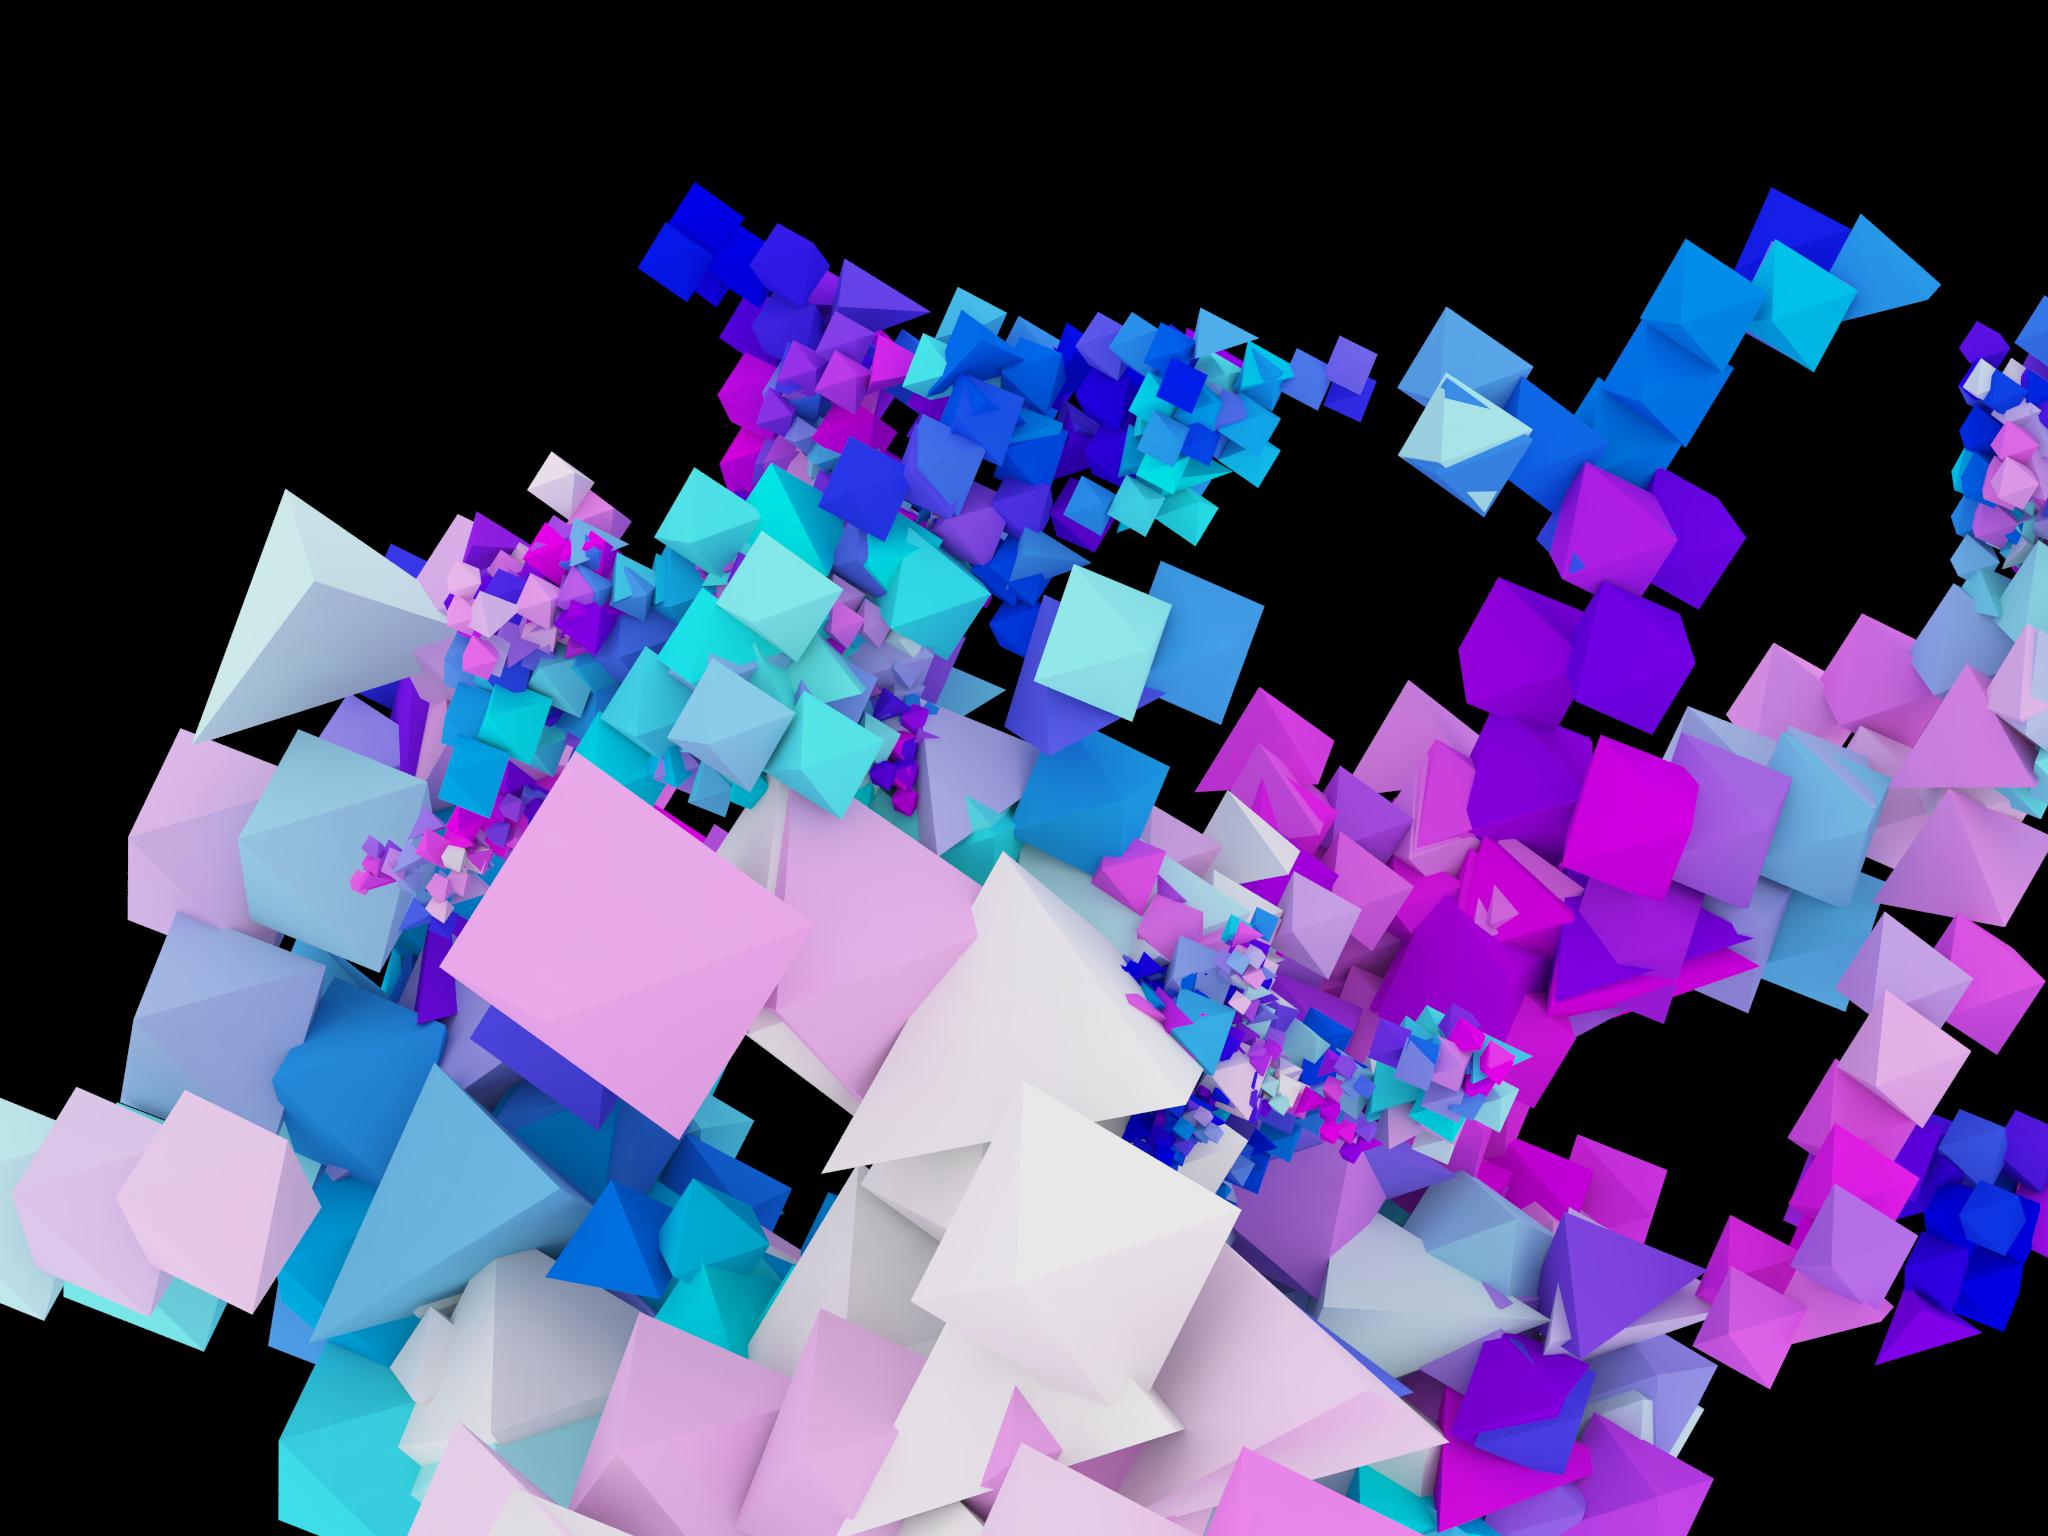 final_render_3.png